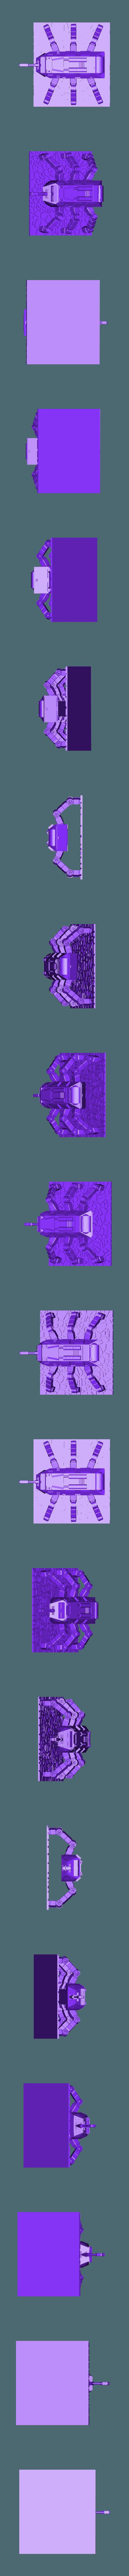 based_ant_example.stl Download free STL file Base for Ant Walker Scifi gaming 28mm • 3D printable design, redstarkits